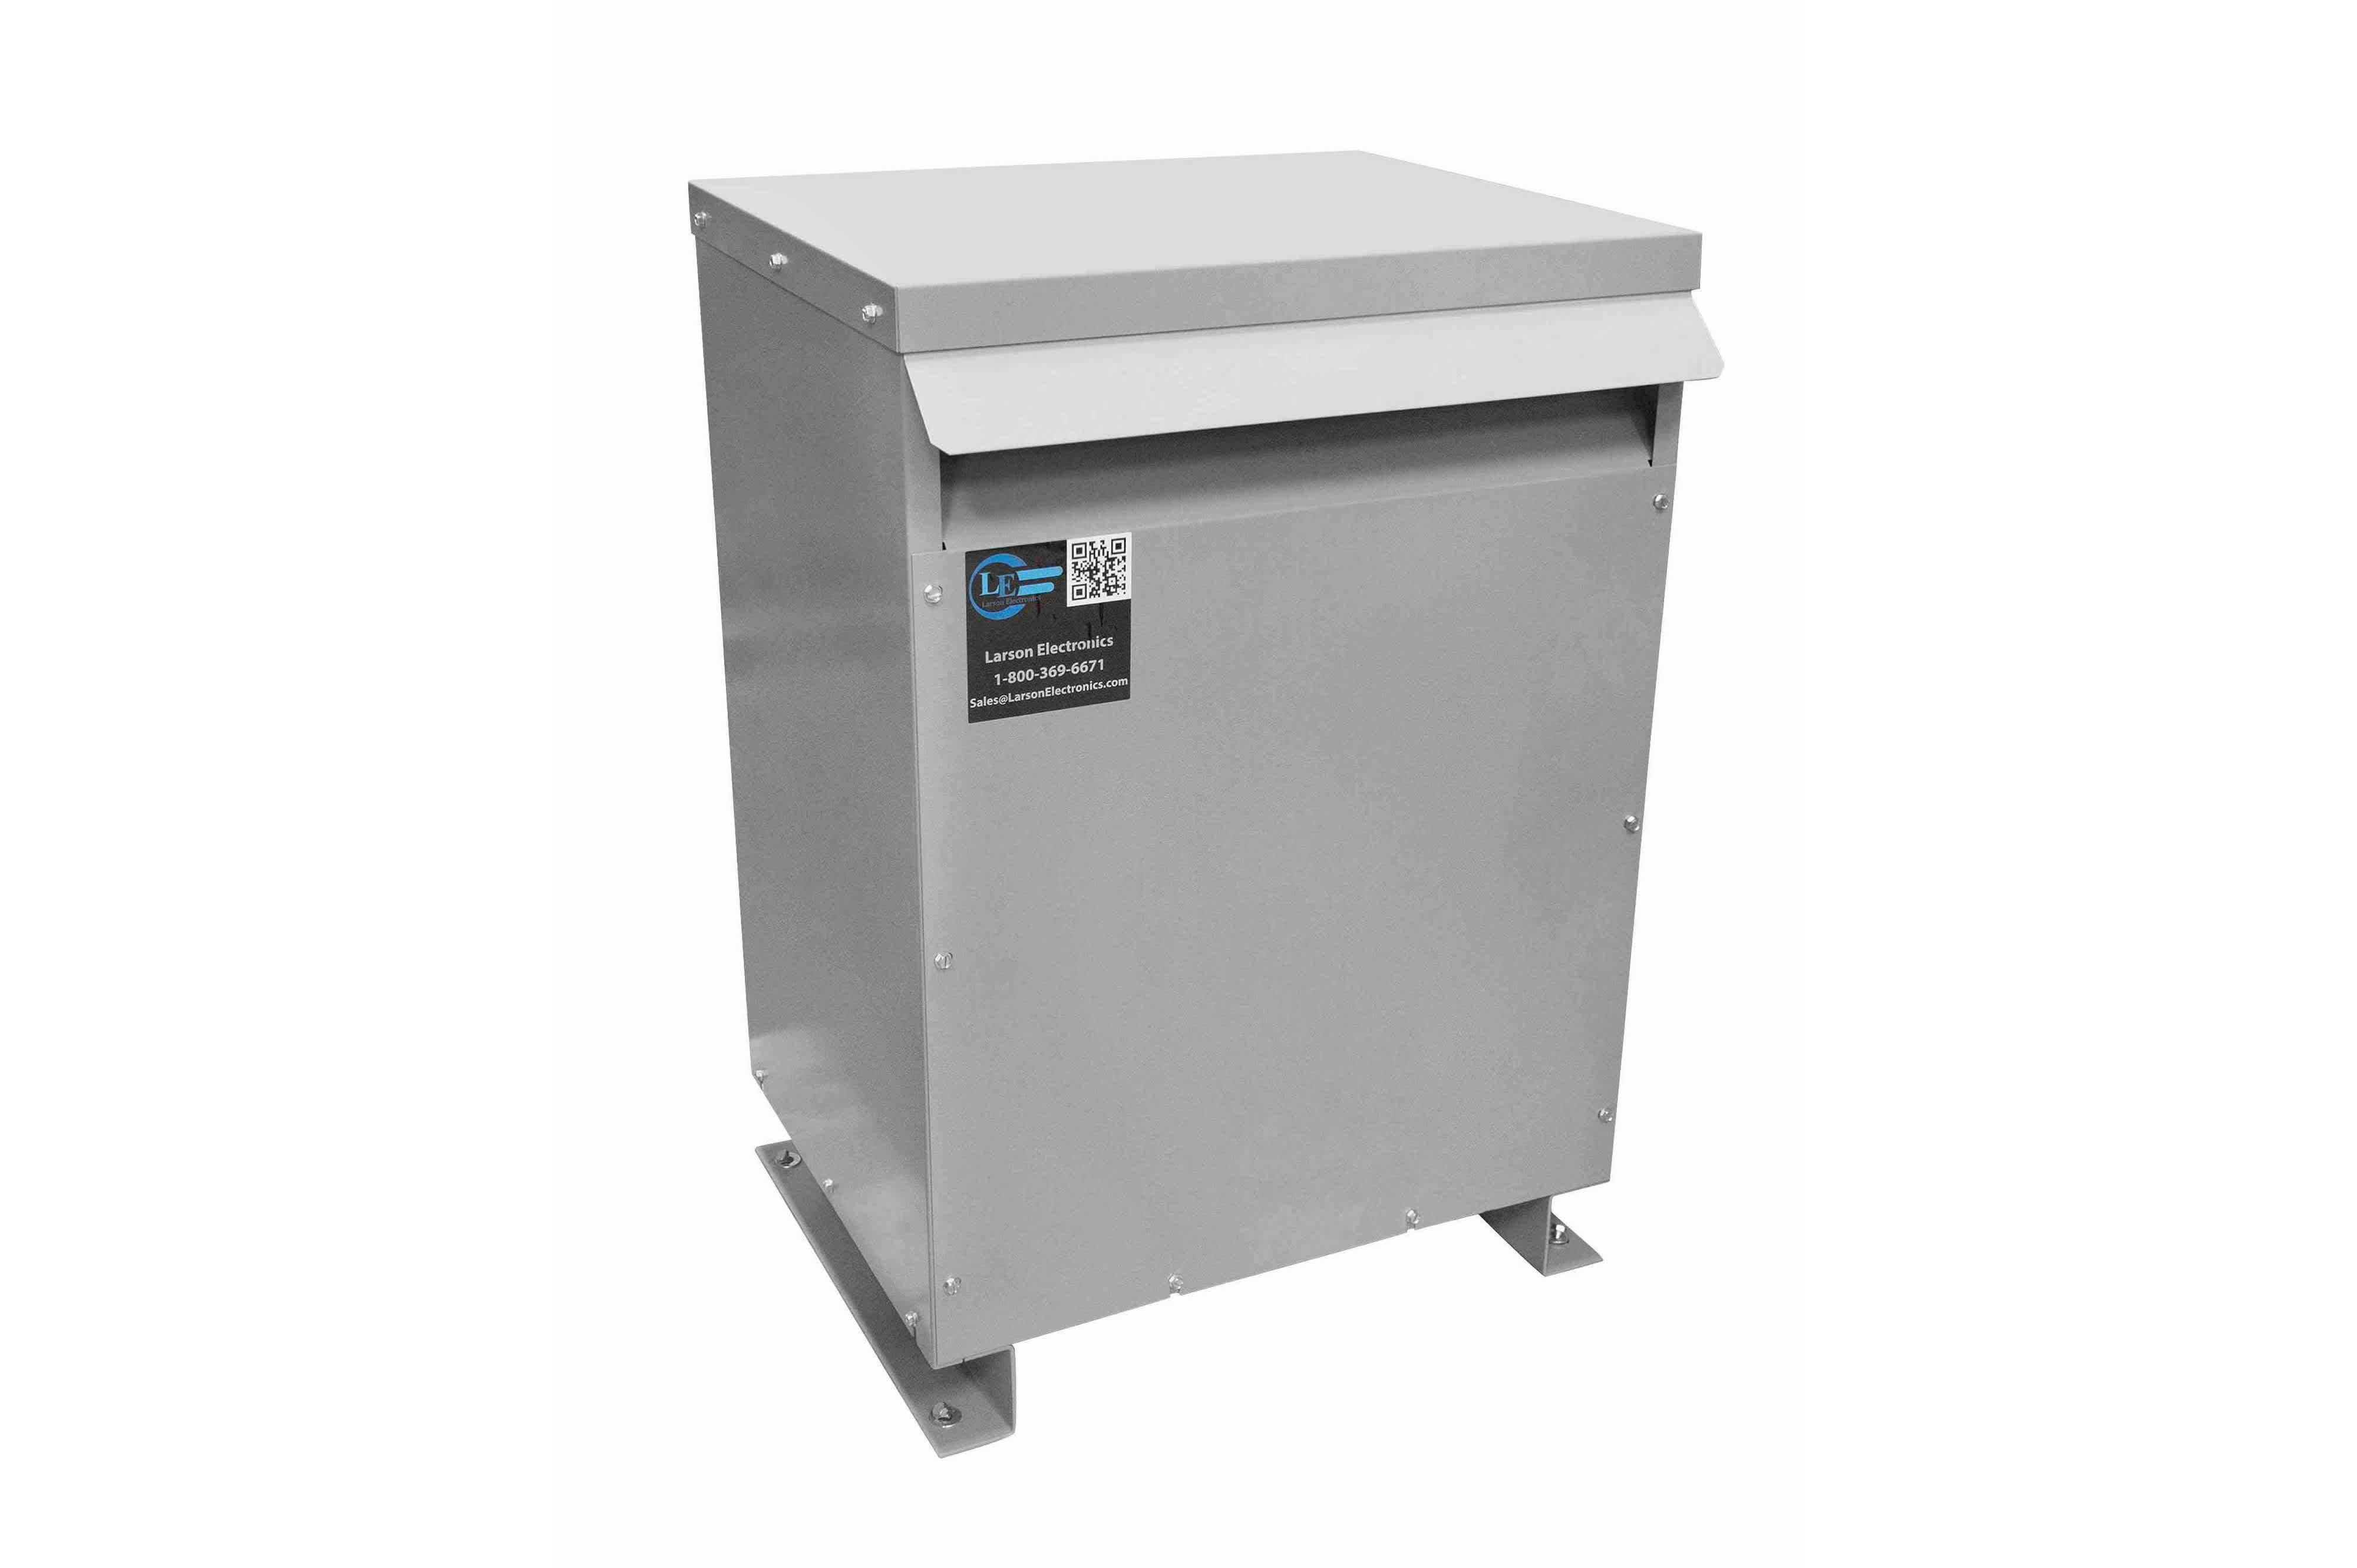 750 kVA 3PH Isolation Transformer, 208V Wye Primary, 400V Delta Secondary, N3R, Ventilated, 60 Hz